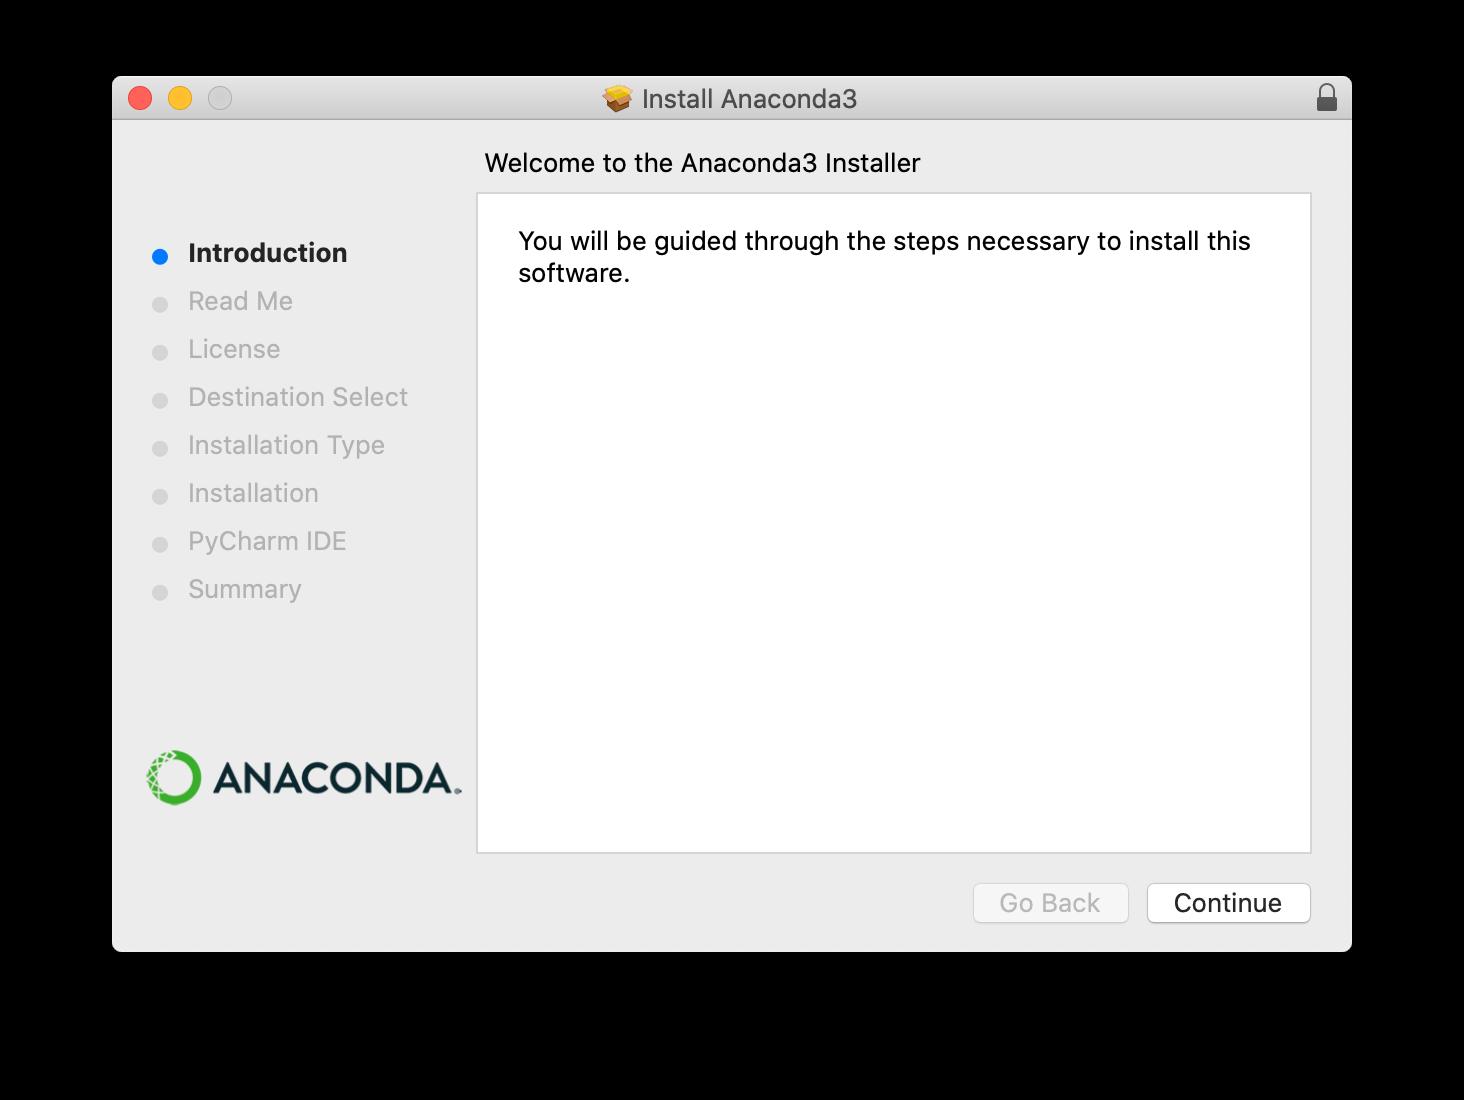 Anaconda installer screenshot step 2